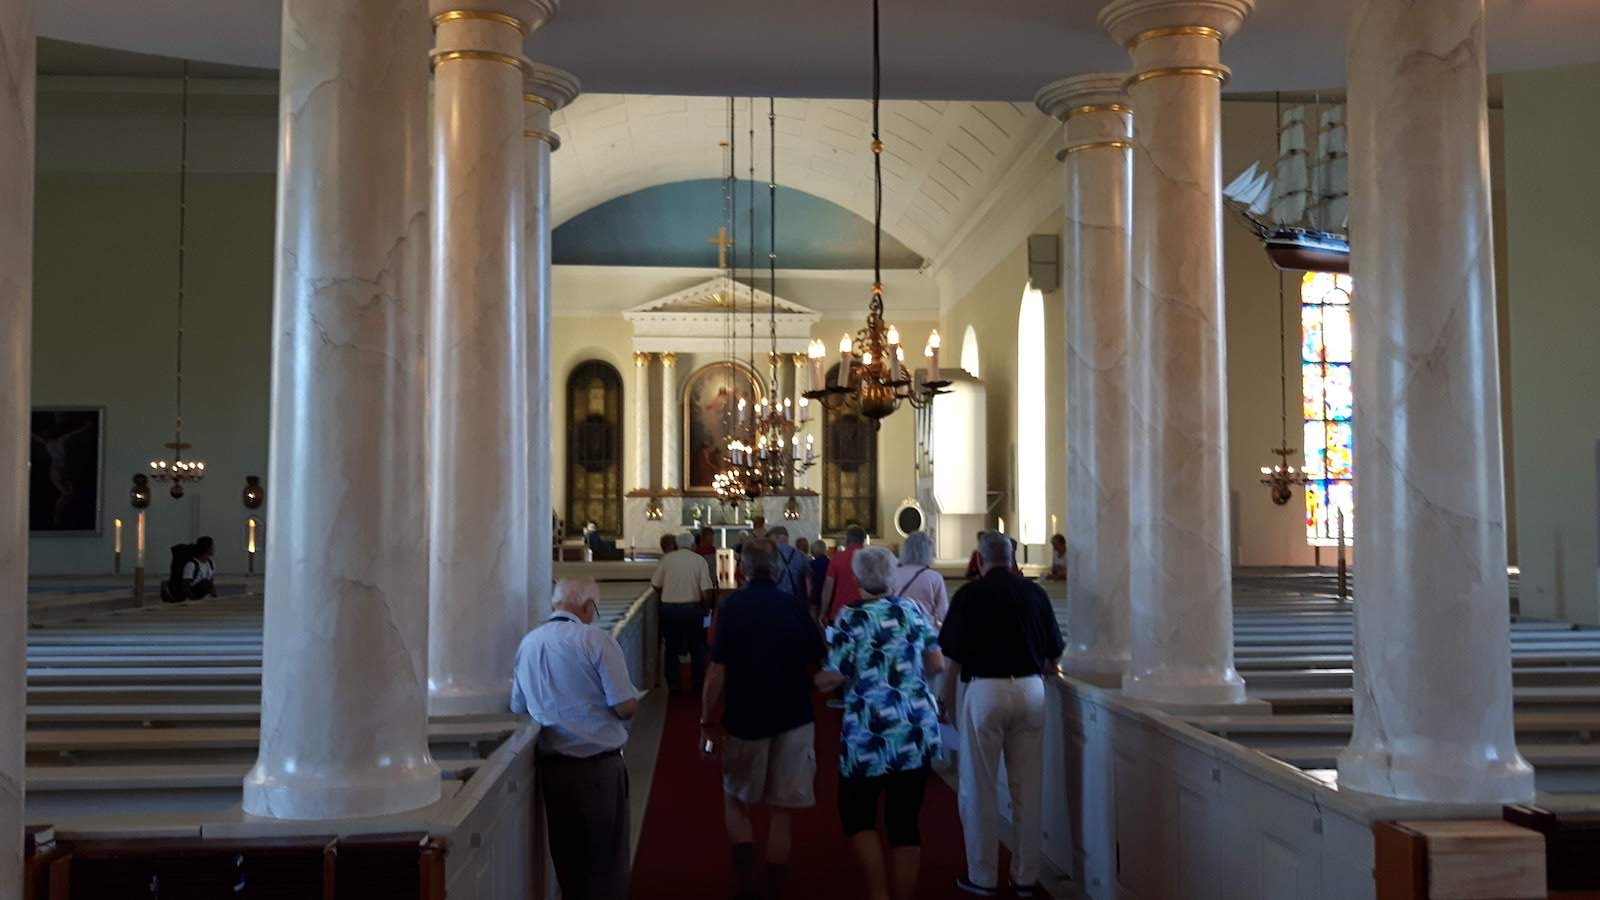 Inside the church Oulu Finland